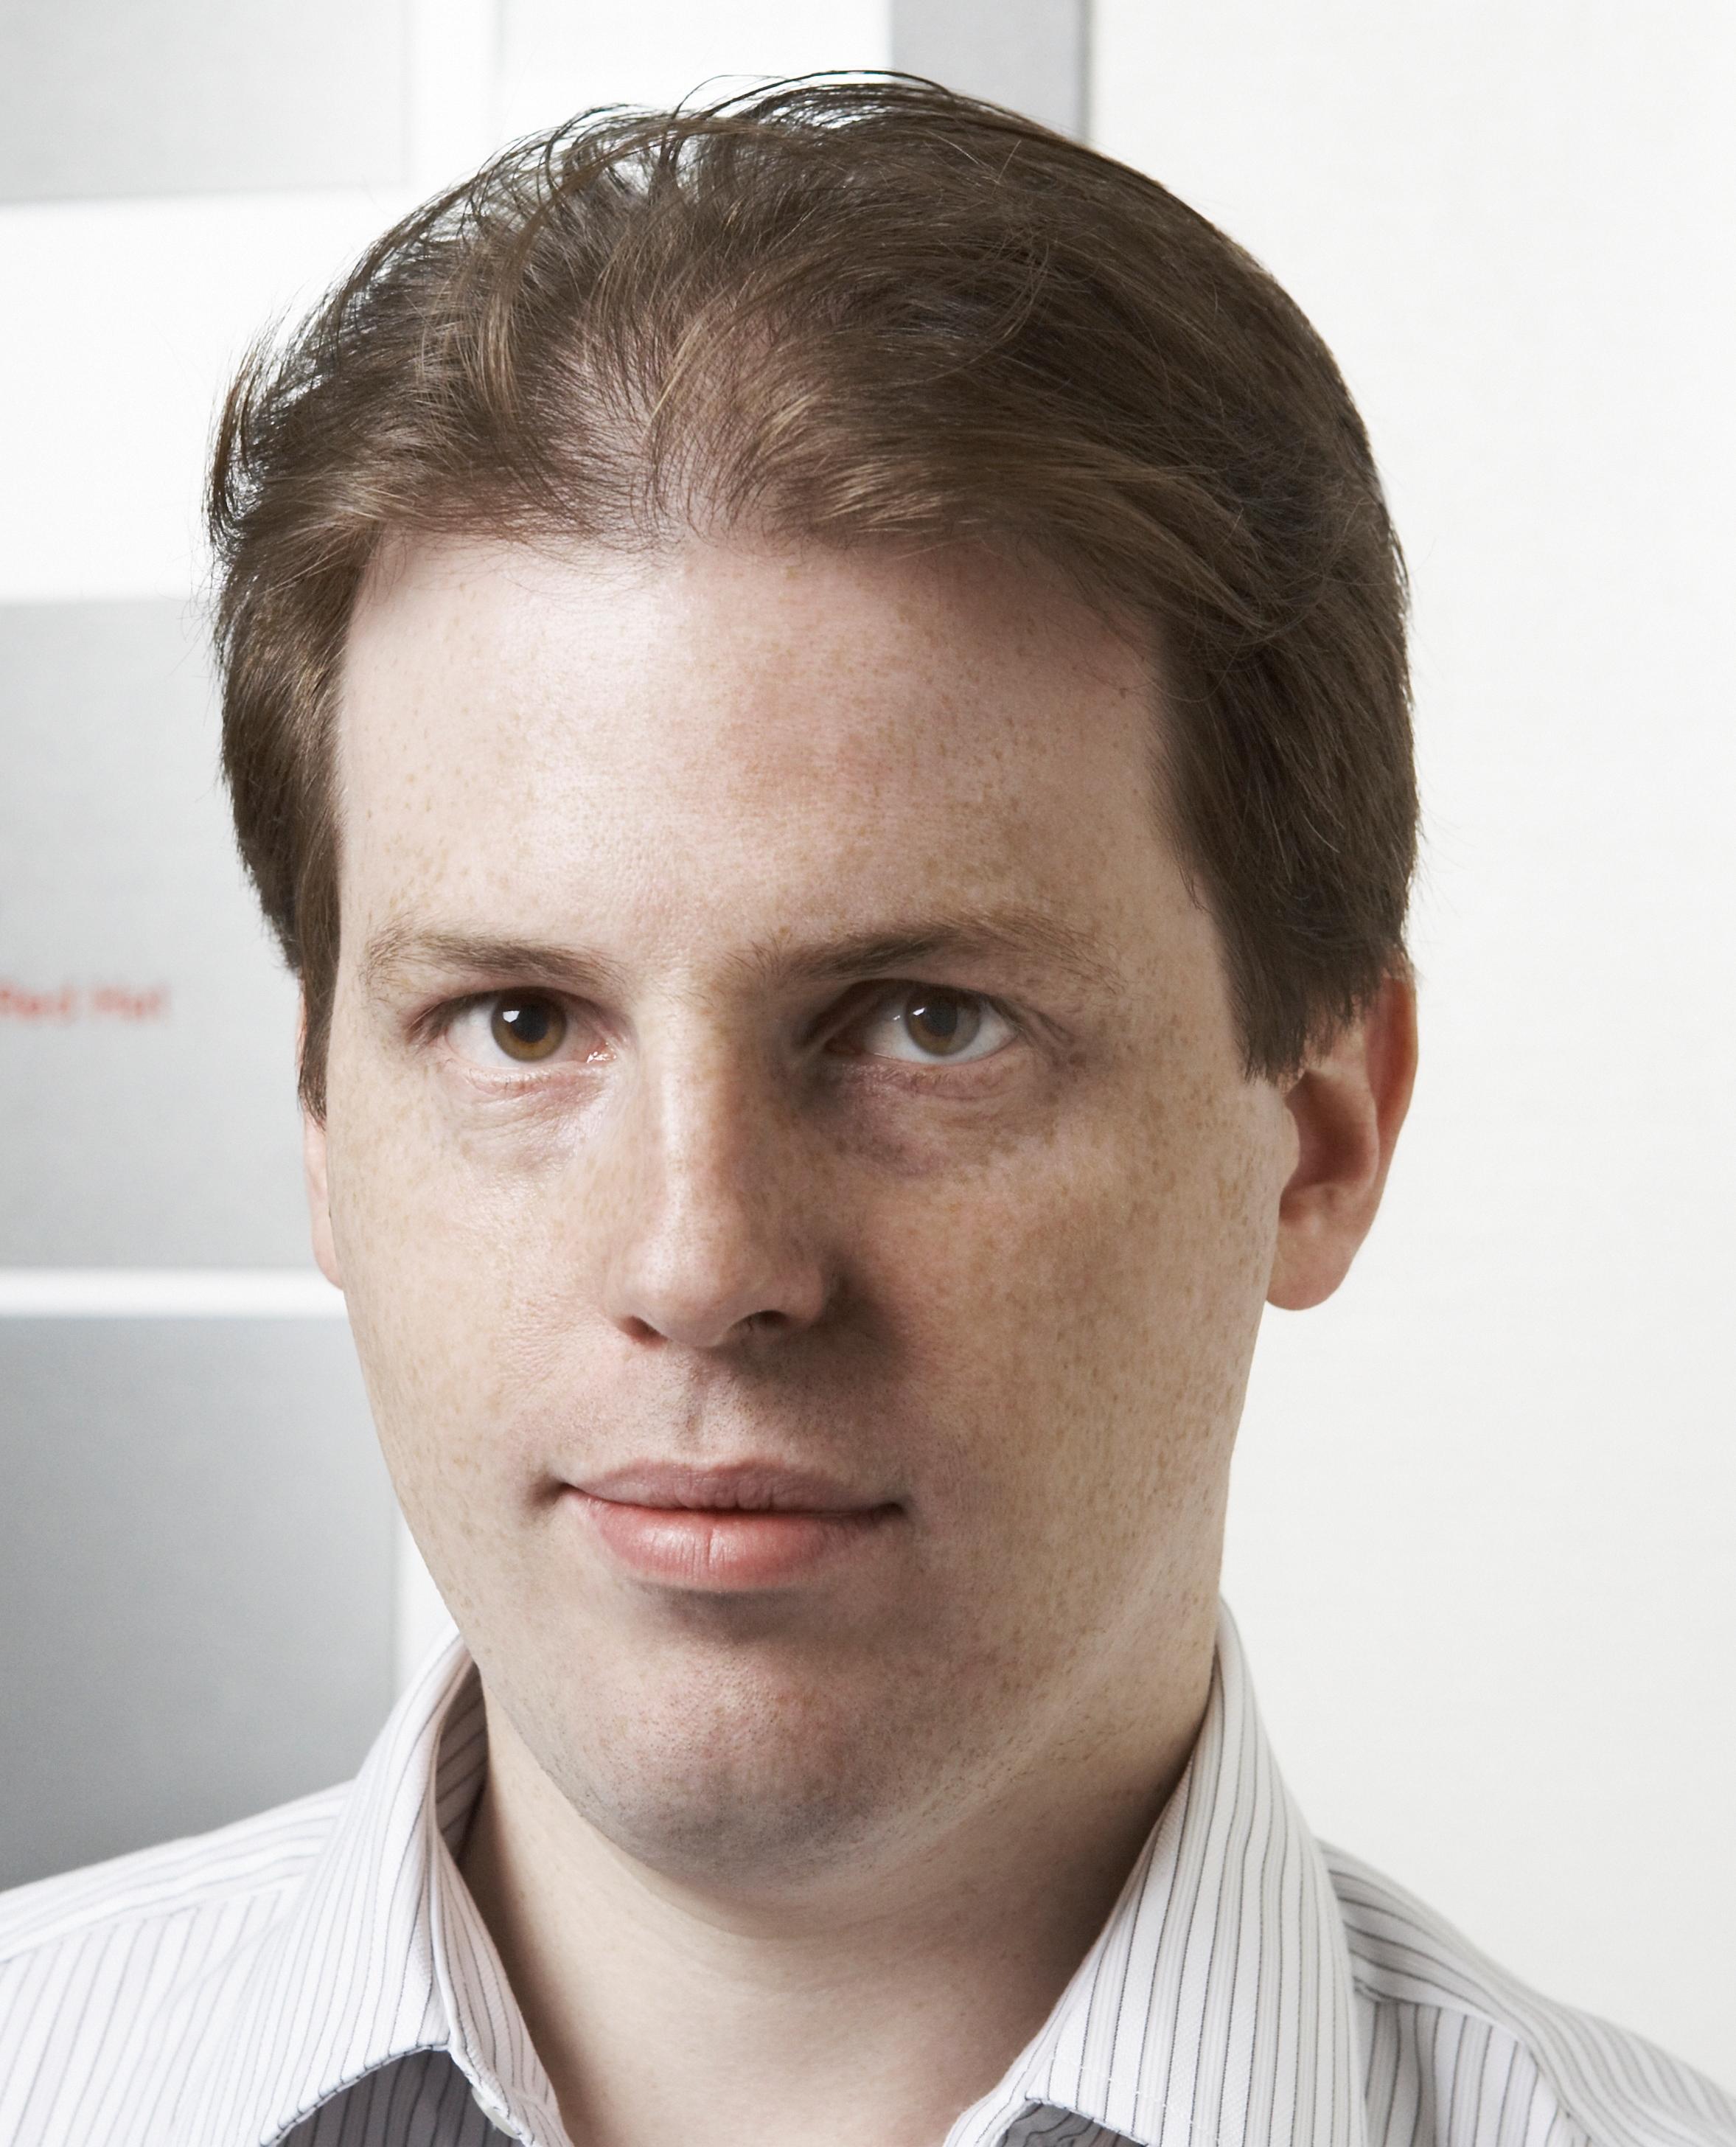 CloudBees CEO Sacha Labourey